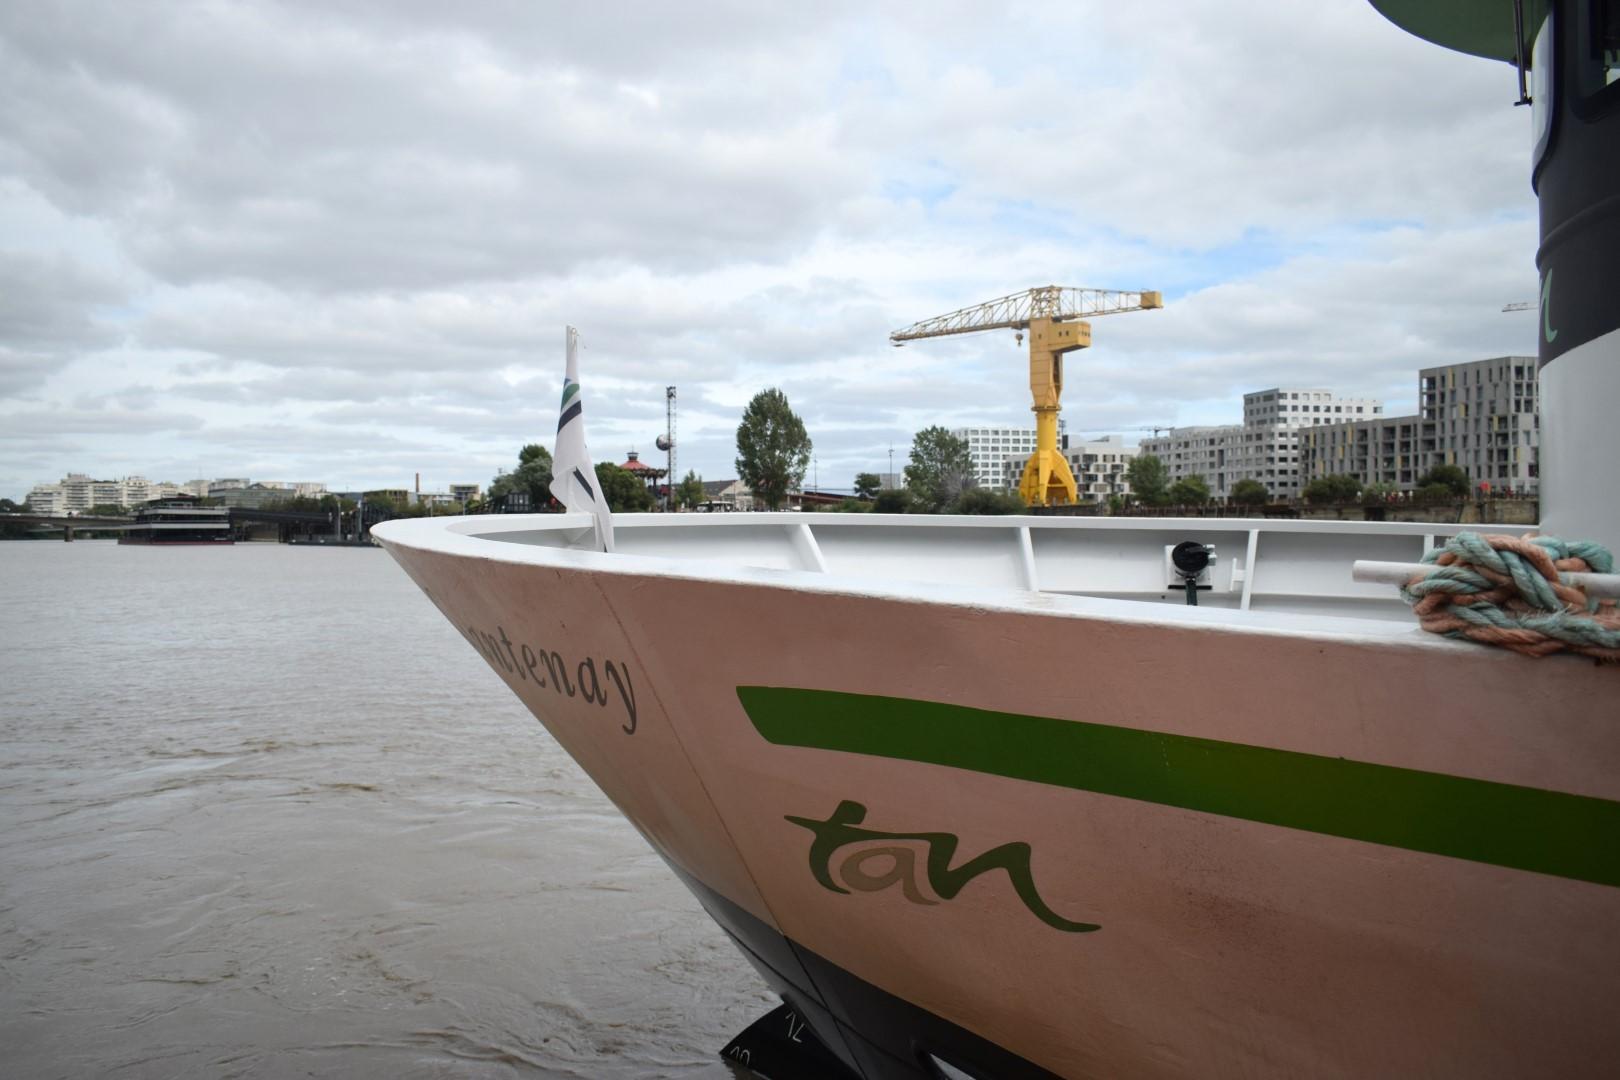 TAN shuttle boat to Trentemoult, Ponton Belem, Quai de la Fosse, Nantes